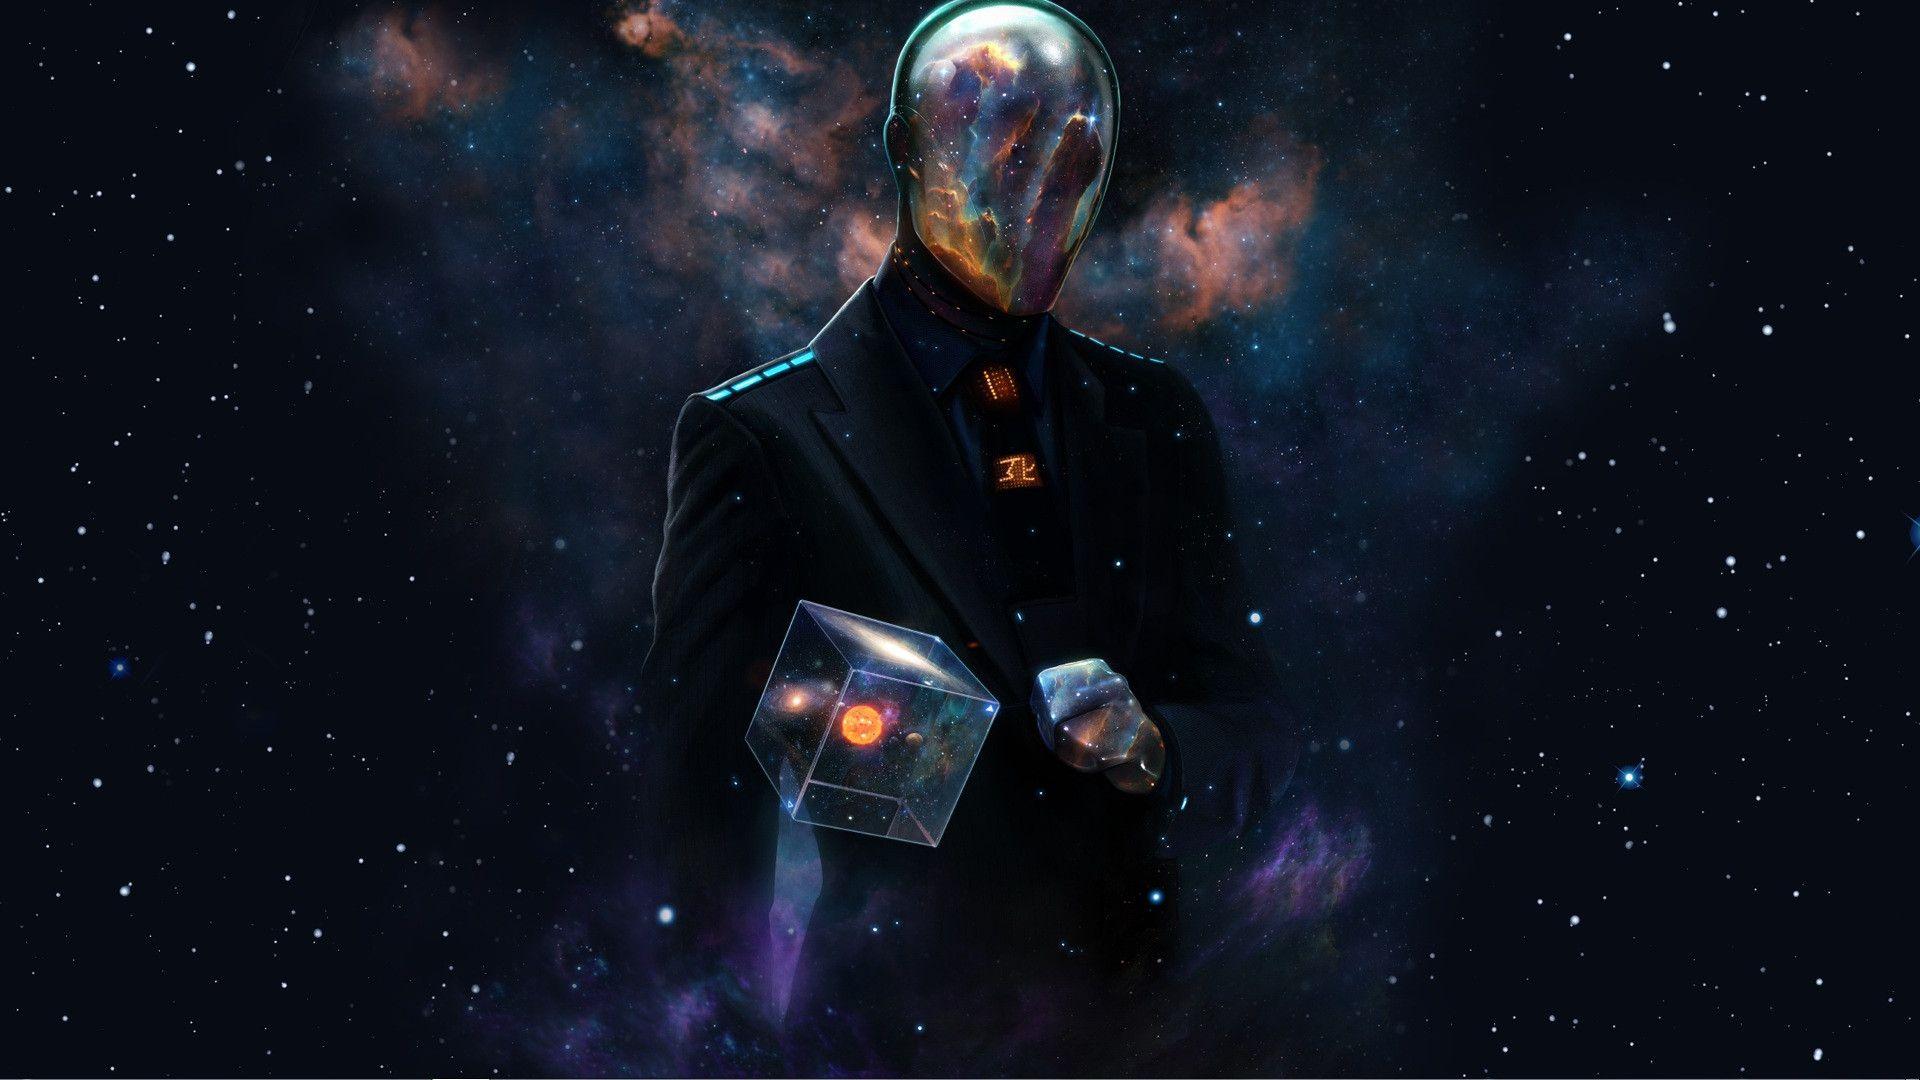 Futuristic Alien Male Alpha Coders Wallpaper Abyss Video